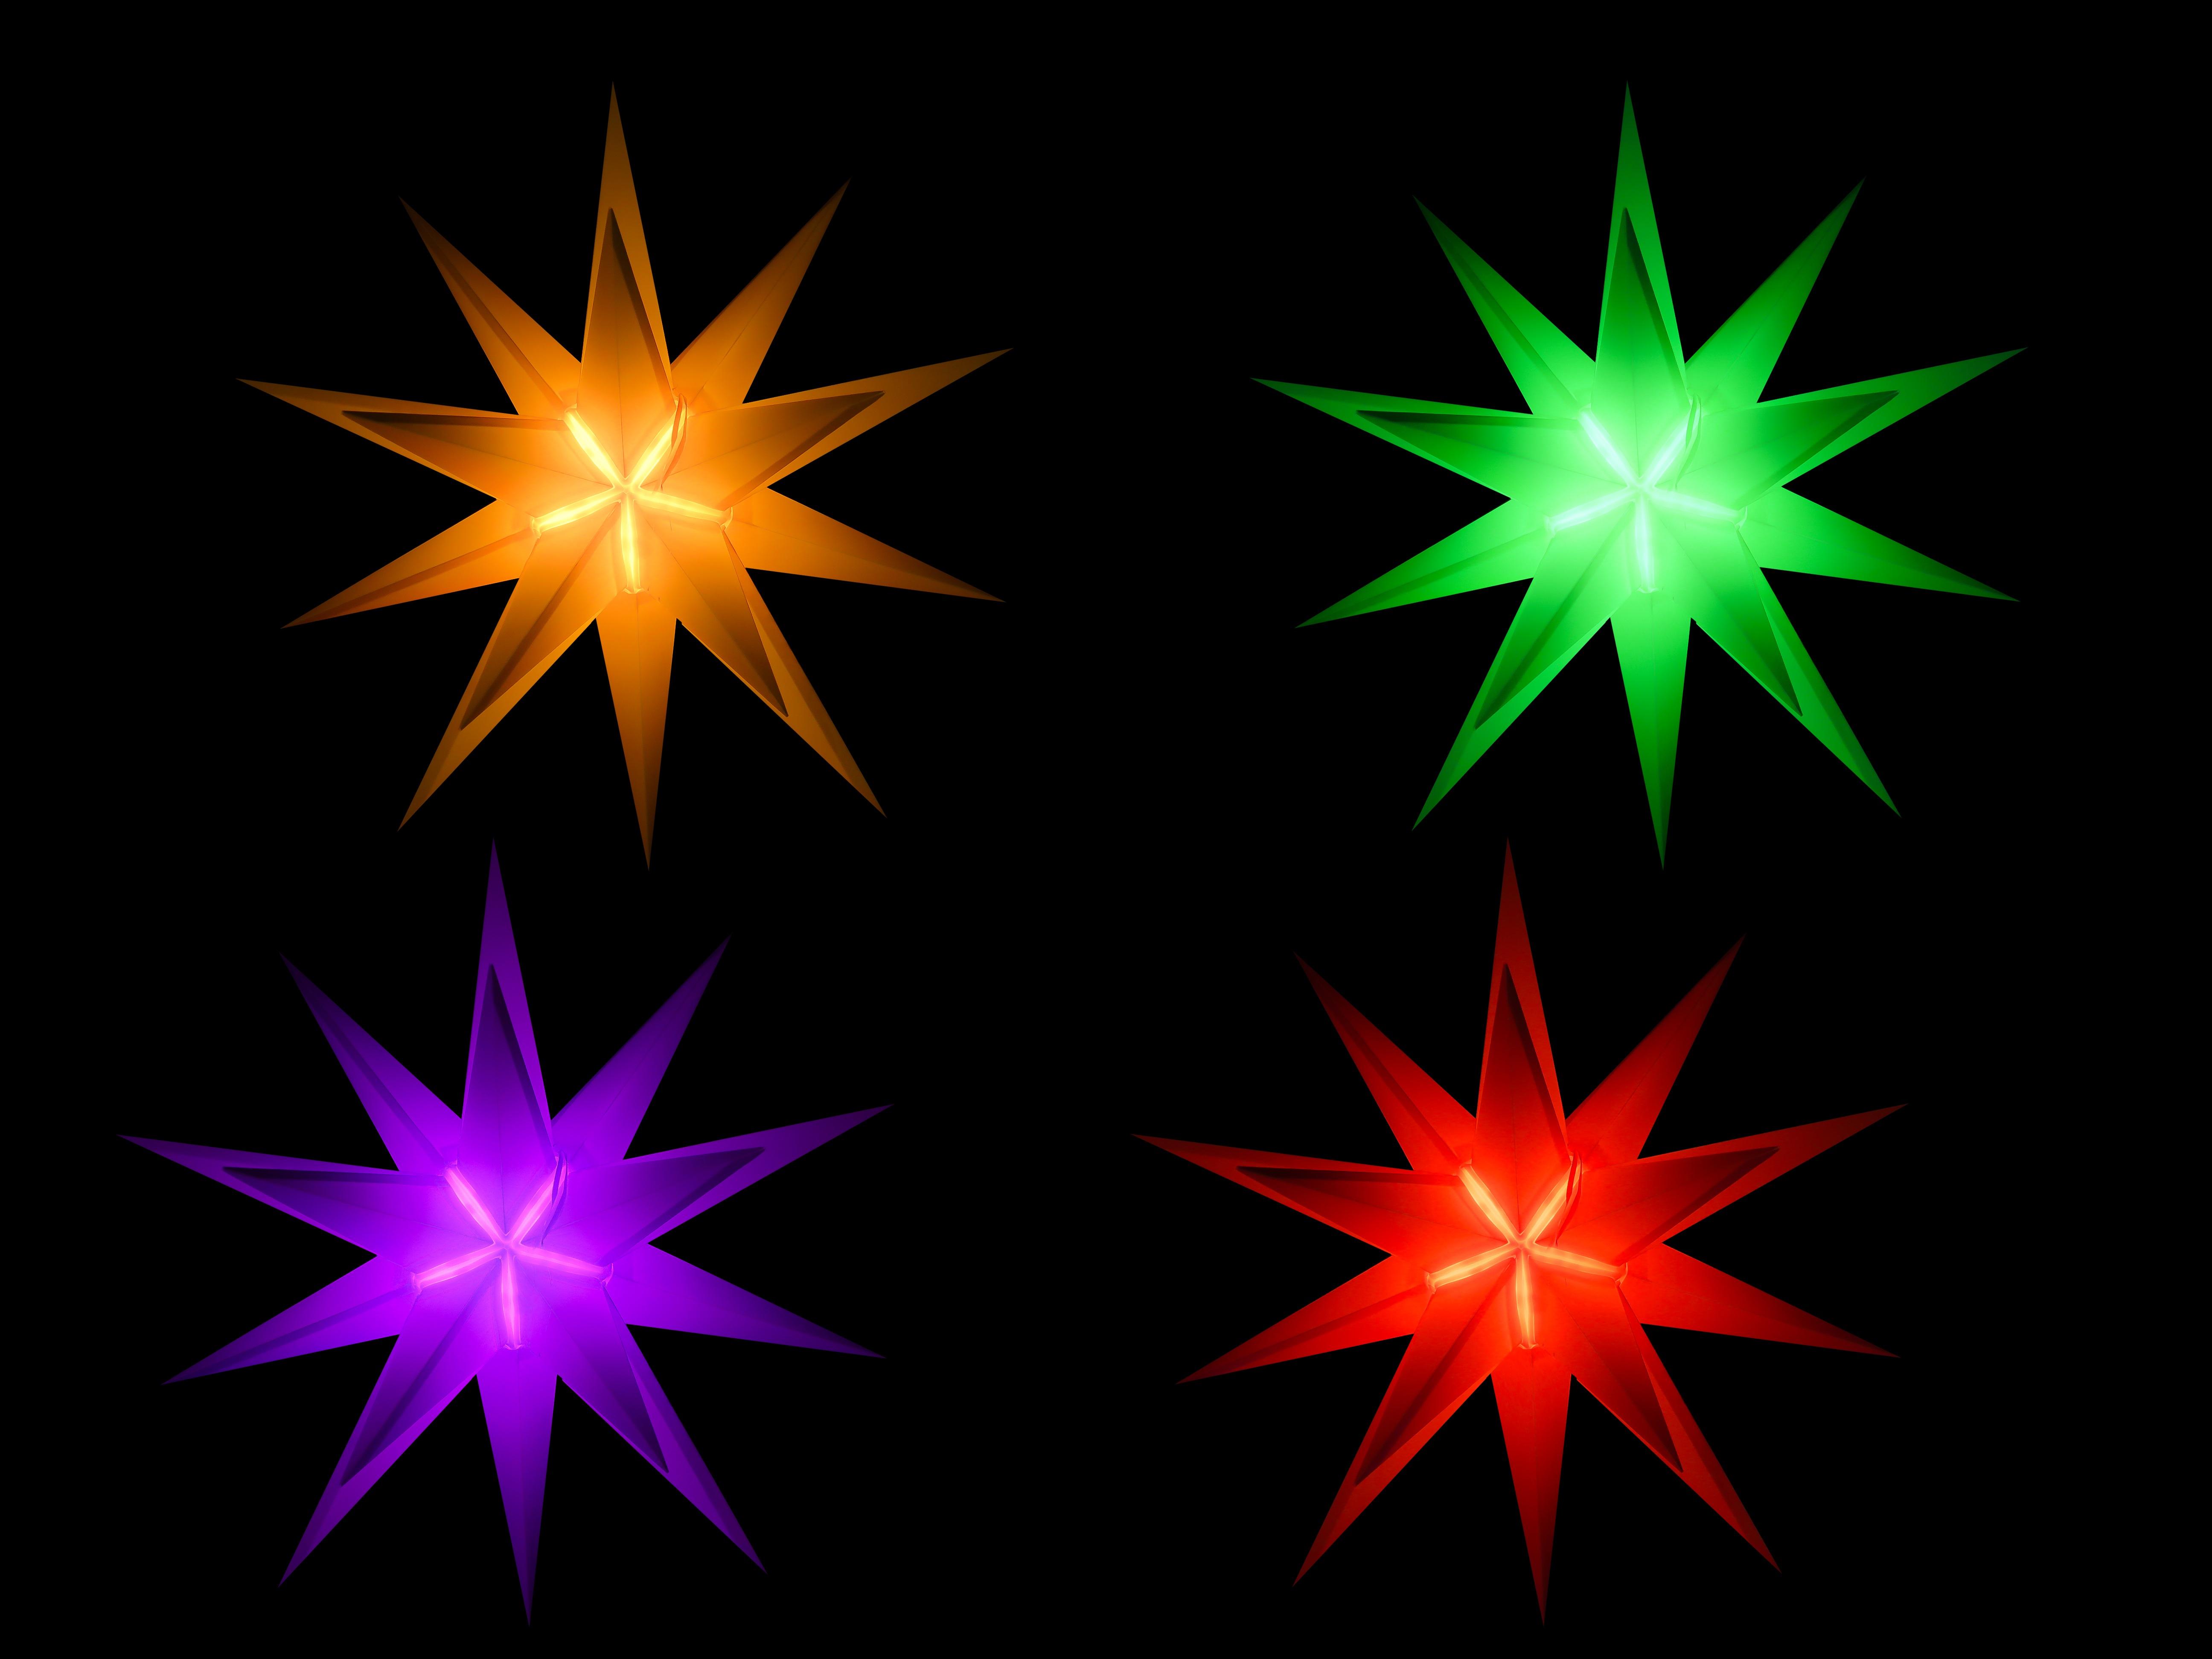 Hyggelig Bildet : stjerne, samling, juletre, løvtre, lønneblad, jul ZC-08